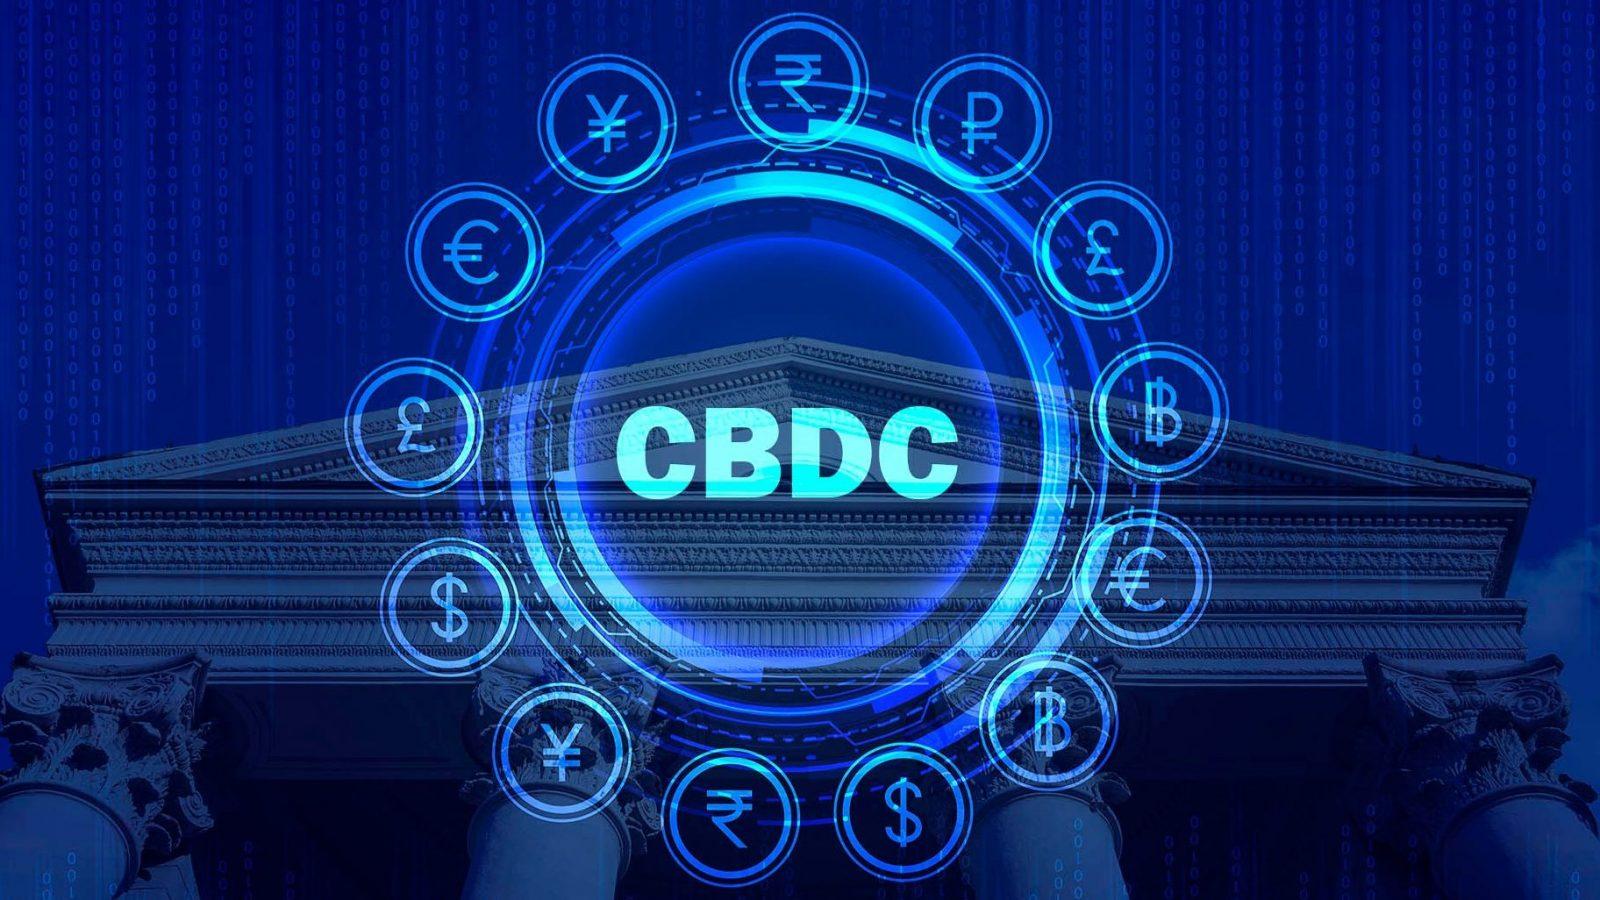 image of CBDCs